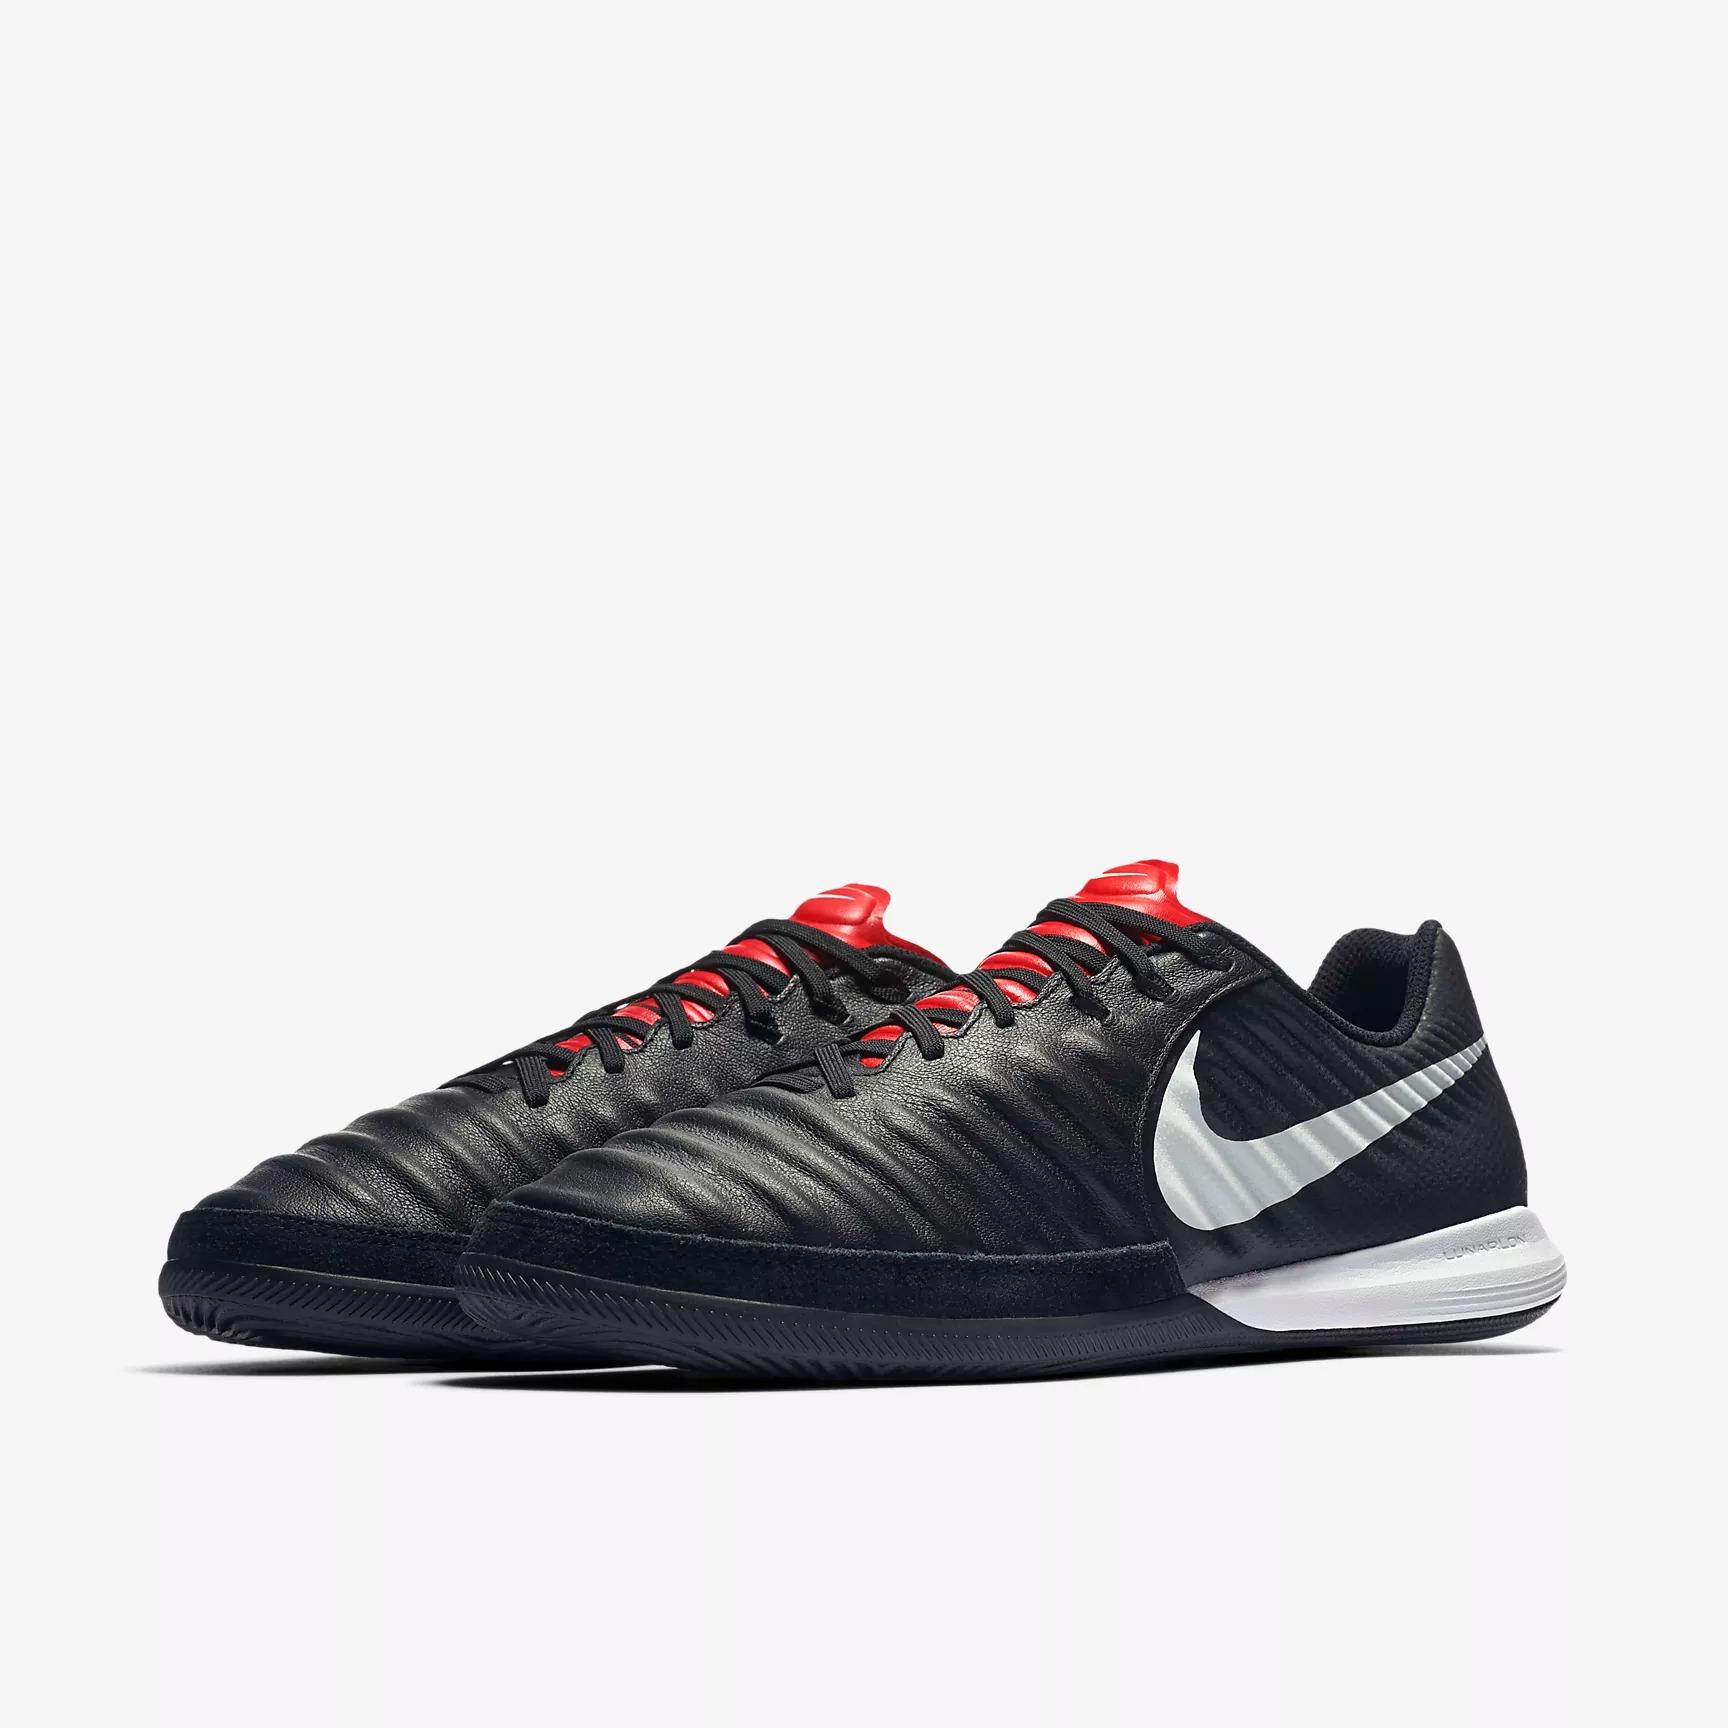 4239ba6d8 Nike TiempoX Lunar Legend VII Pro IC Soccer Cleats - Soccer Cleats Nike  Football Boots - Superfanas.lt